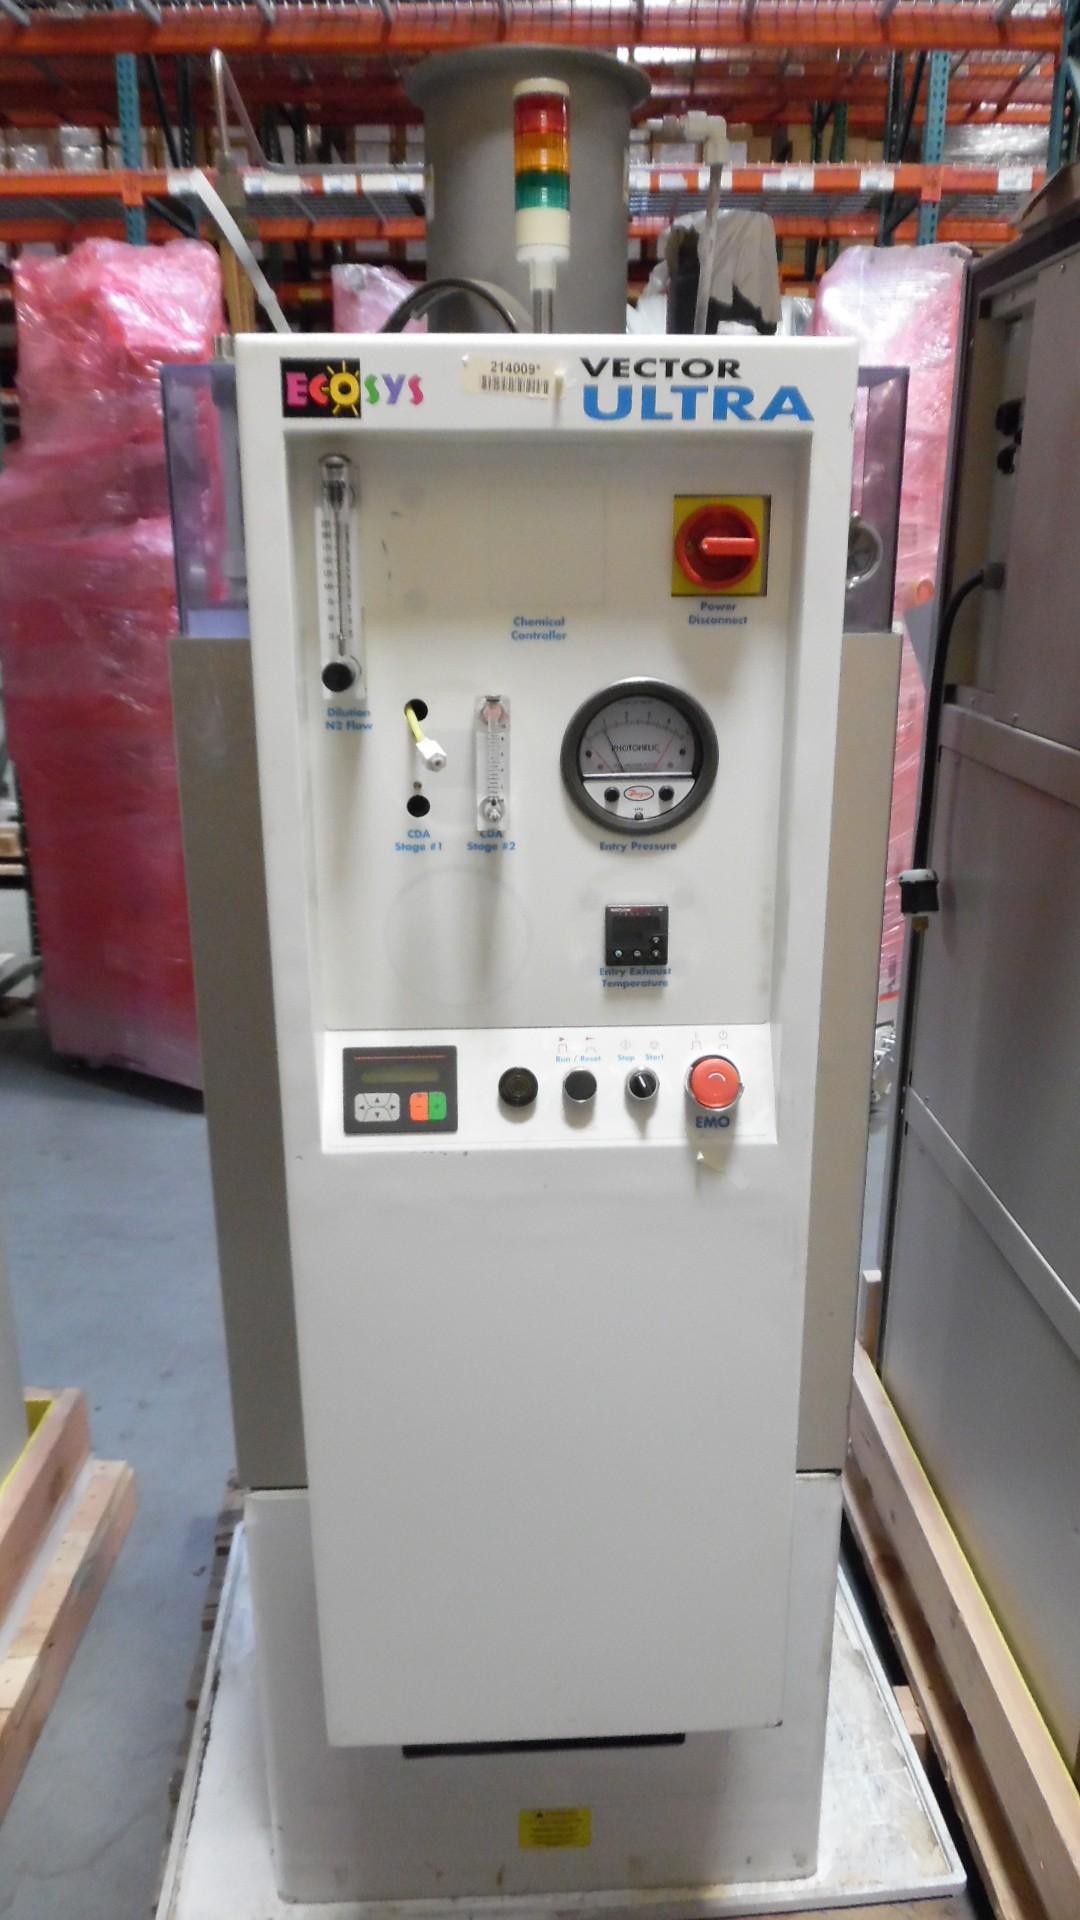 Ecosys VSI-AAOY Vector Ultra SI Scrubber